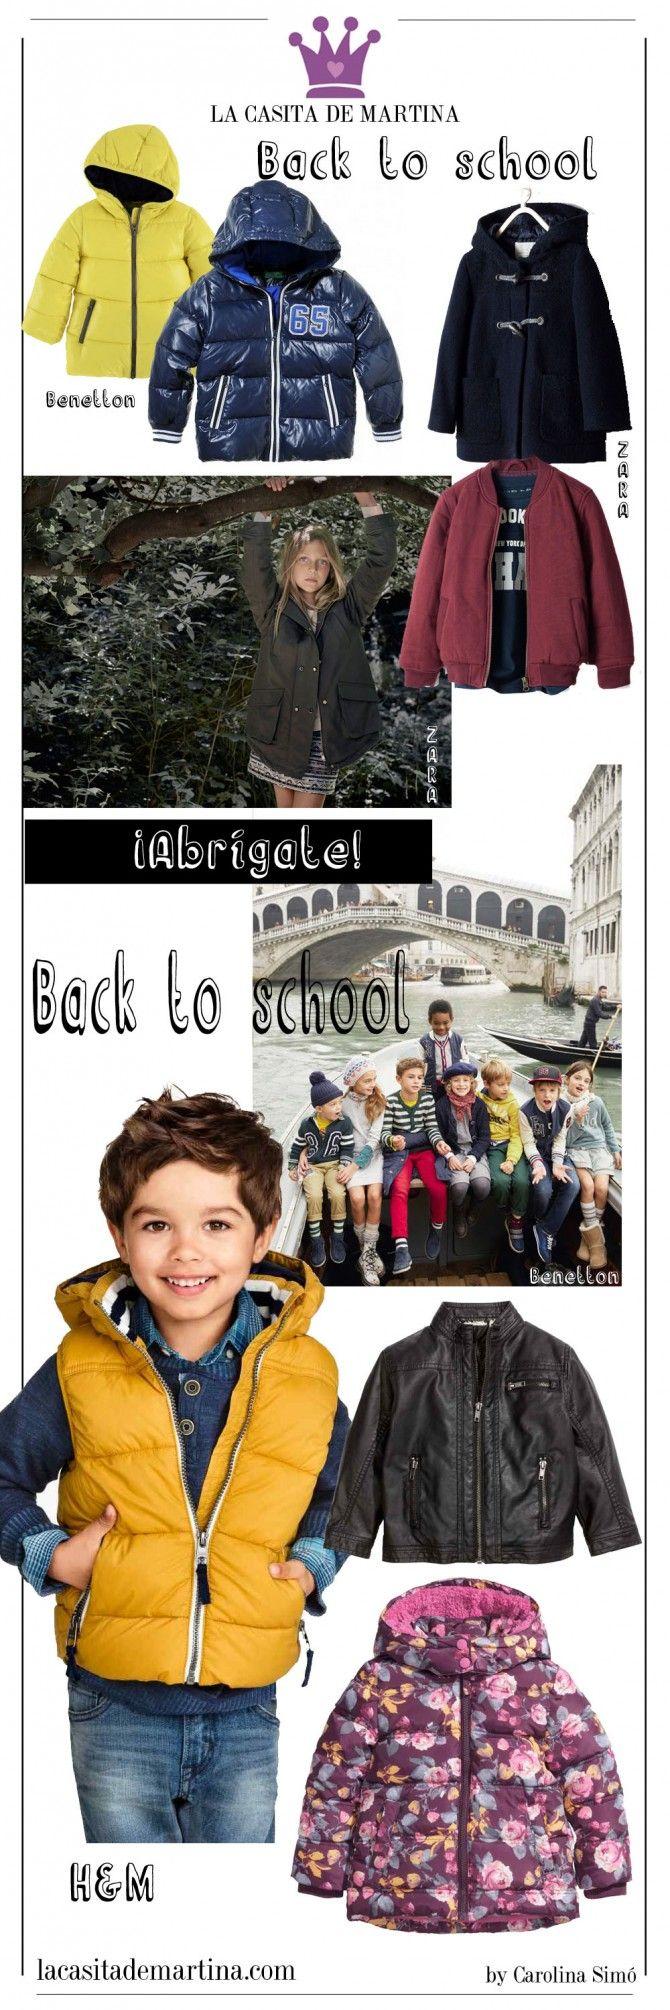 www.lacasitademartina.com  #modainfantil #fashionkids #kids #childrensfashion #kidsfashion #niños #streetstyle #streetstylekids #vueltaalcole #backtoschool  ♥ La 15 prendas de abrigo BACK TO SCHOOL que no te pueden faltar ♥ Blog de Moda Infantil : ♥ La casita de Martina ♥ Blog Moda Infantil y Moda Premamá, Tendencias Moda Infantil